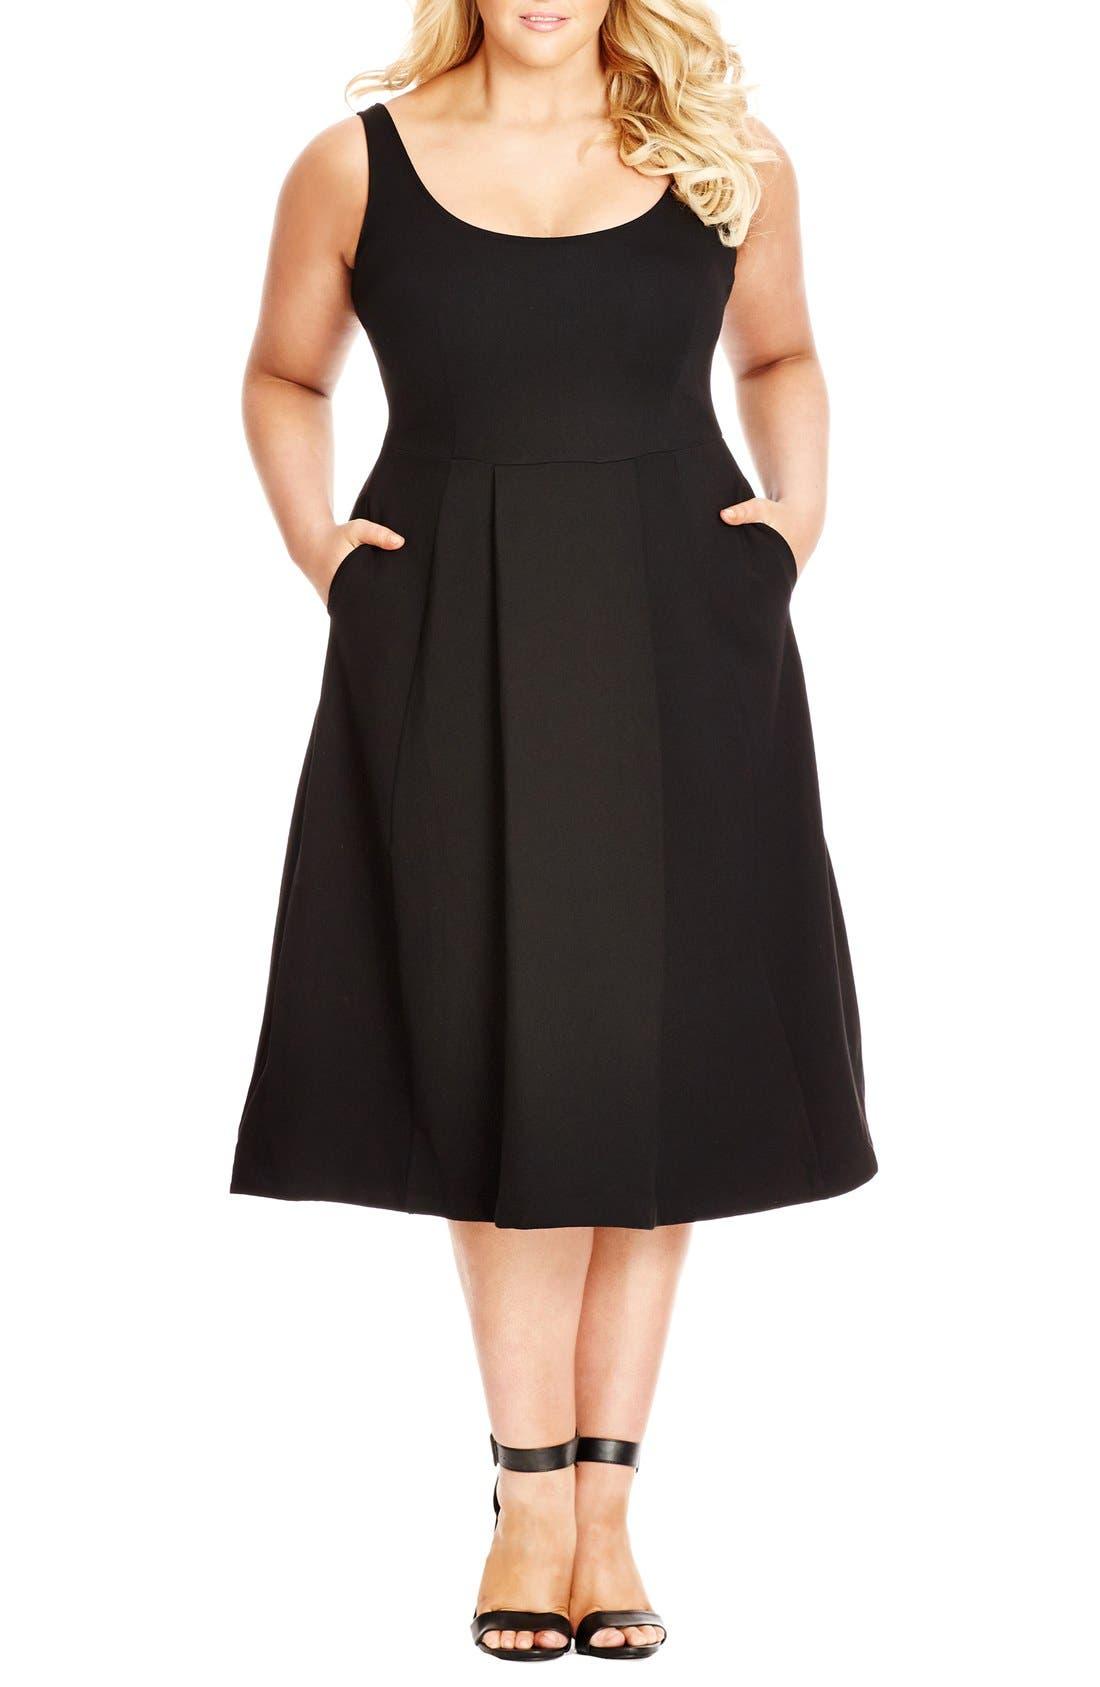 Plus Size City Chic Classic Longline Scoop Neck Midi Dress